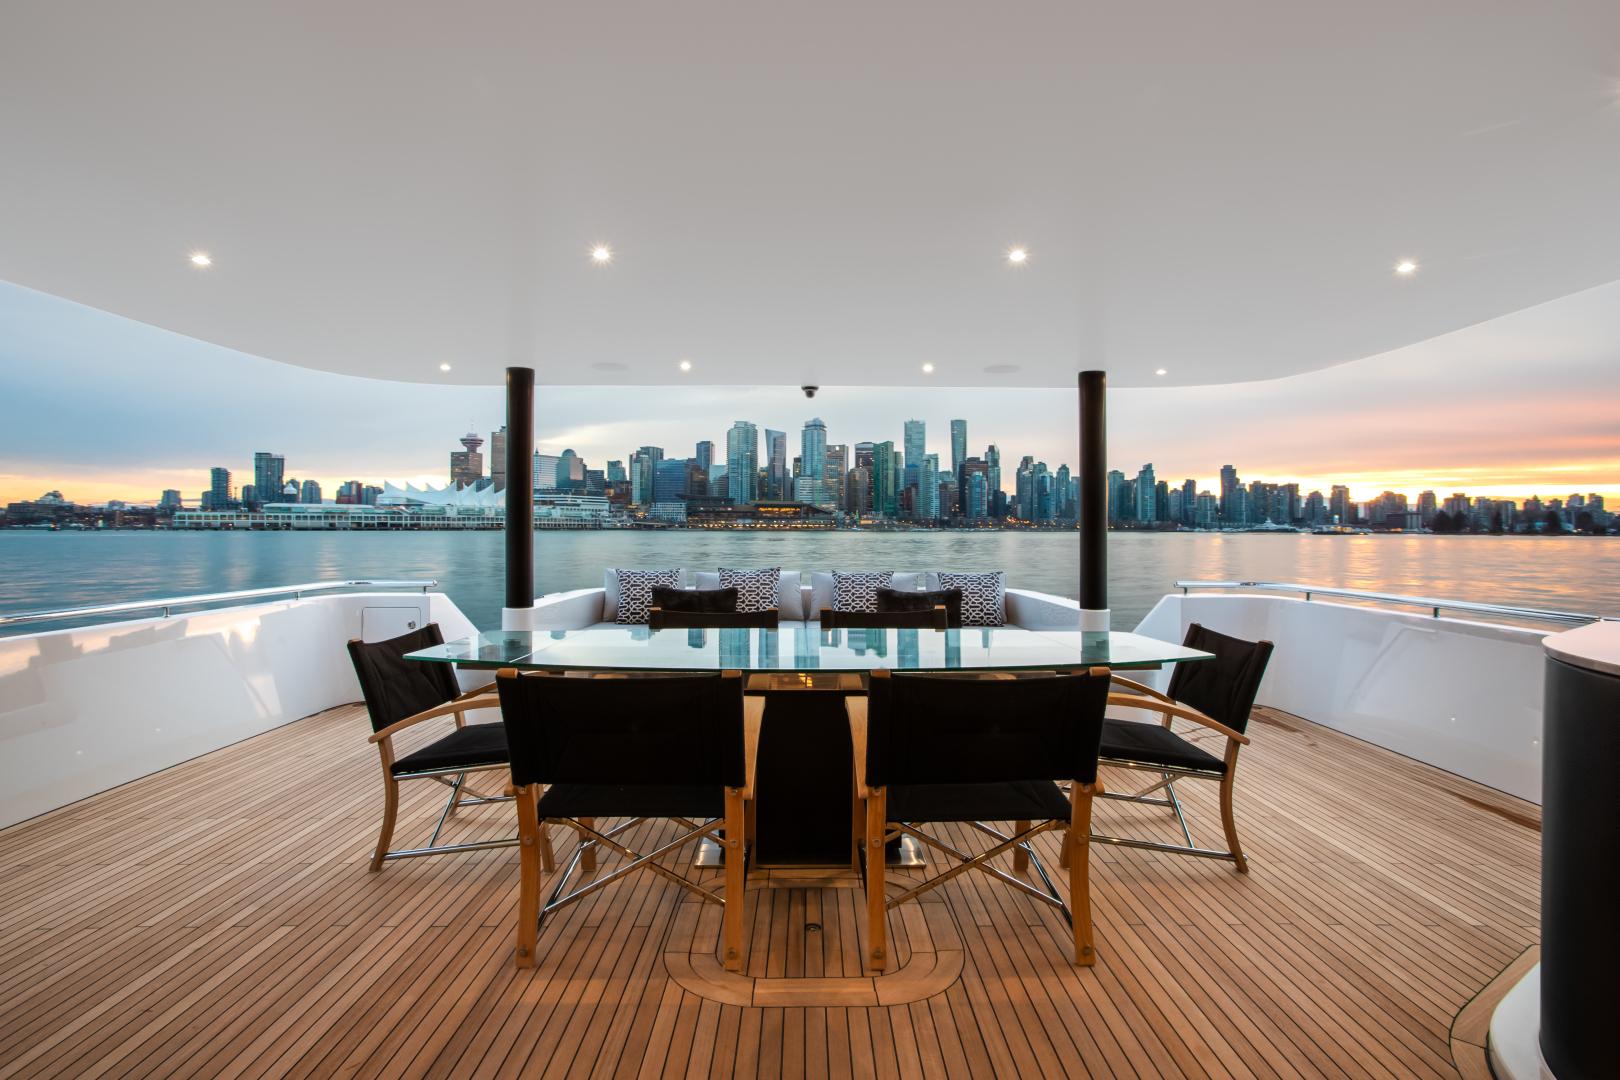 Crescent-Custom Fast Pilothouse Yacht 2020-CRESCENT 117 Vancouver-British Columbia-Canada-1343630   Thumbnail